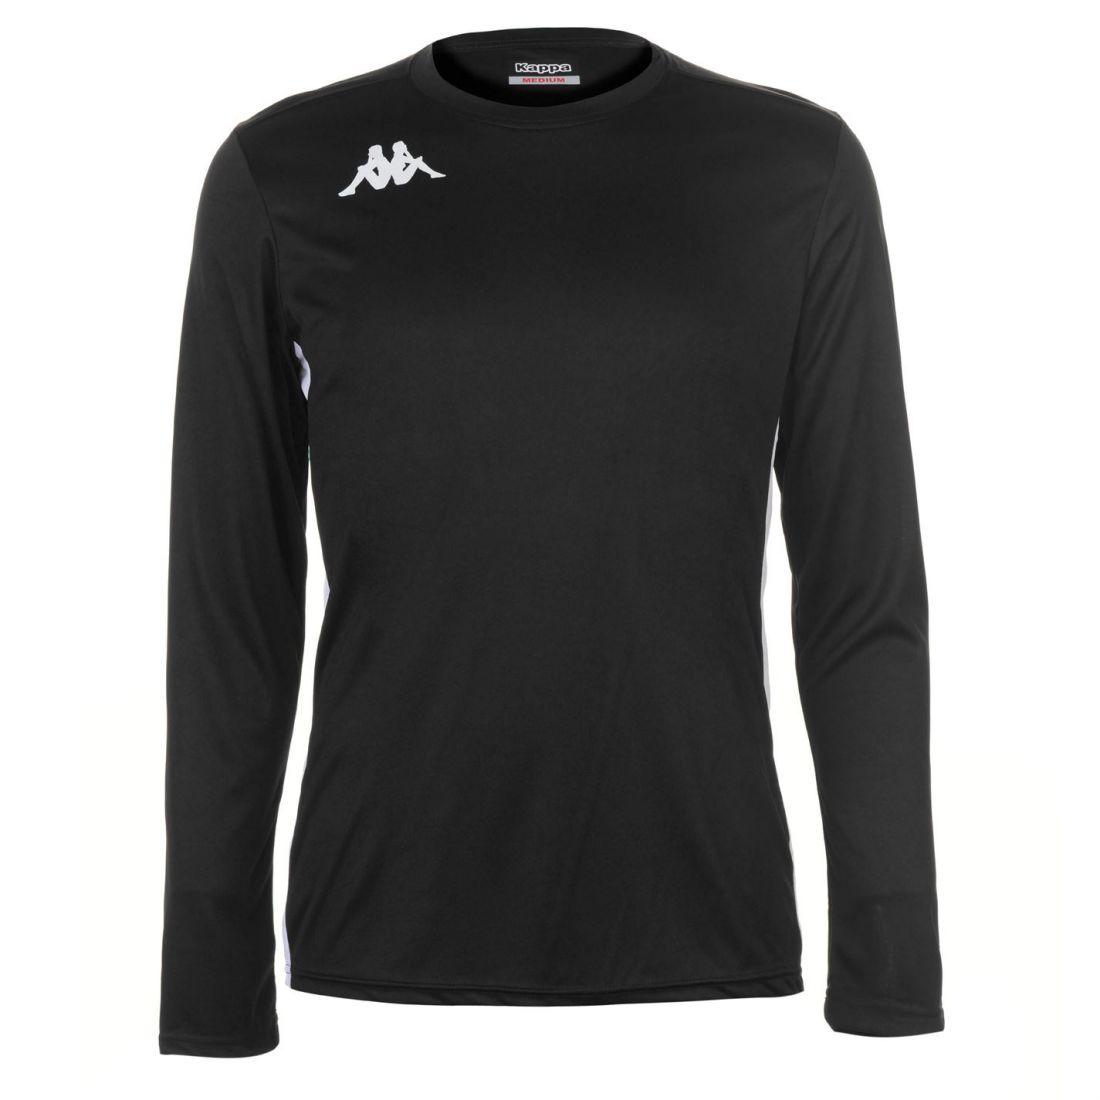 9ef468c6dc95 Kappa Mens Torino Long Sleeve T Shirt Crew Neck Top Lightweight Mesh ...